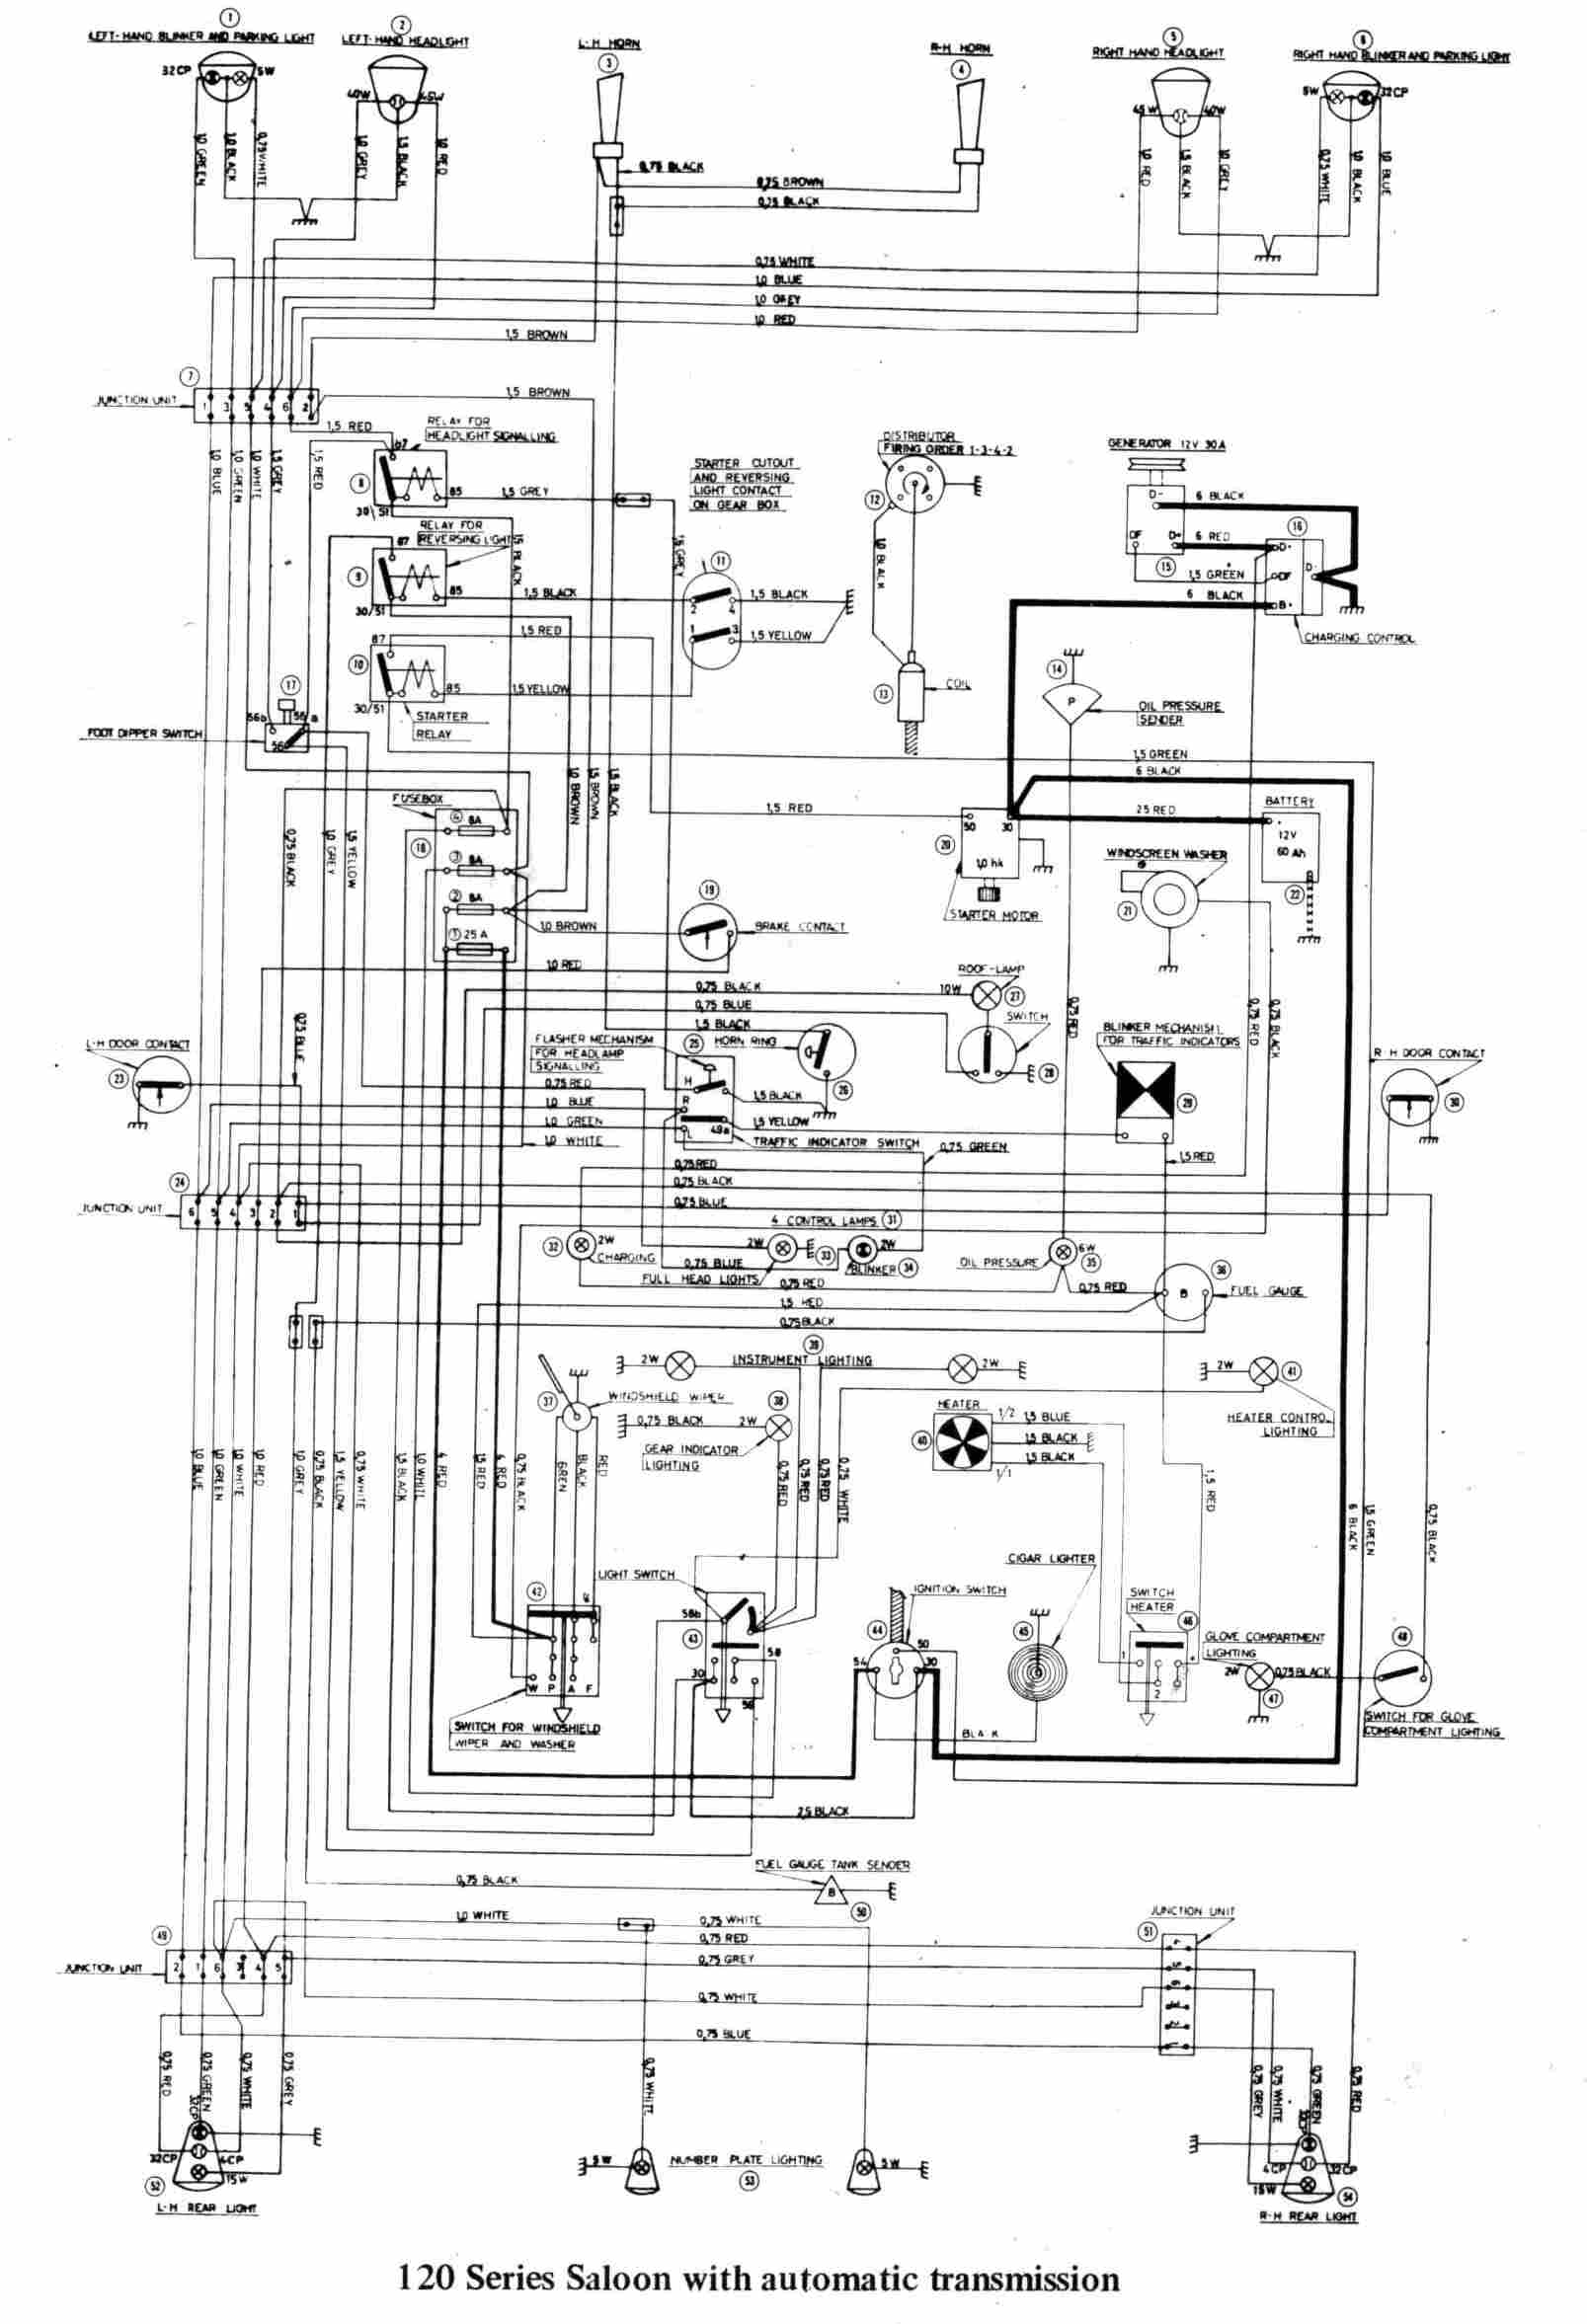 volvo 122s wiring diagrams carknowledge rh carknowledge info Volvo Semi Truck Wiring Diagram Volvo XC90 Wiring-Diagram